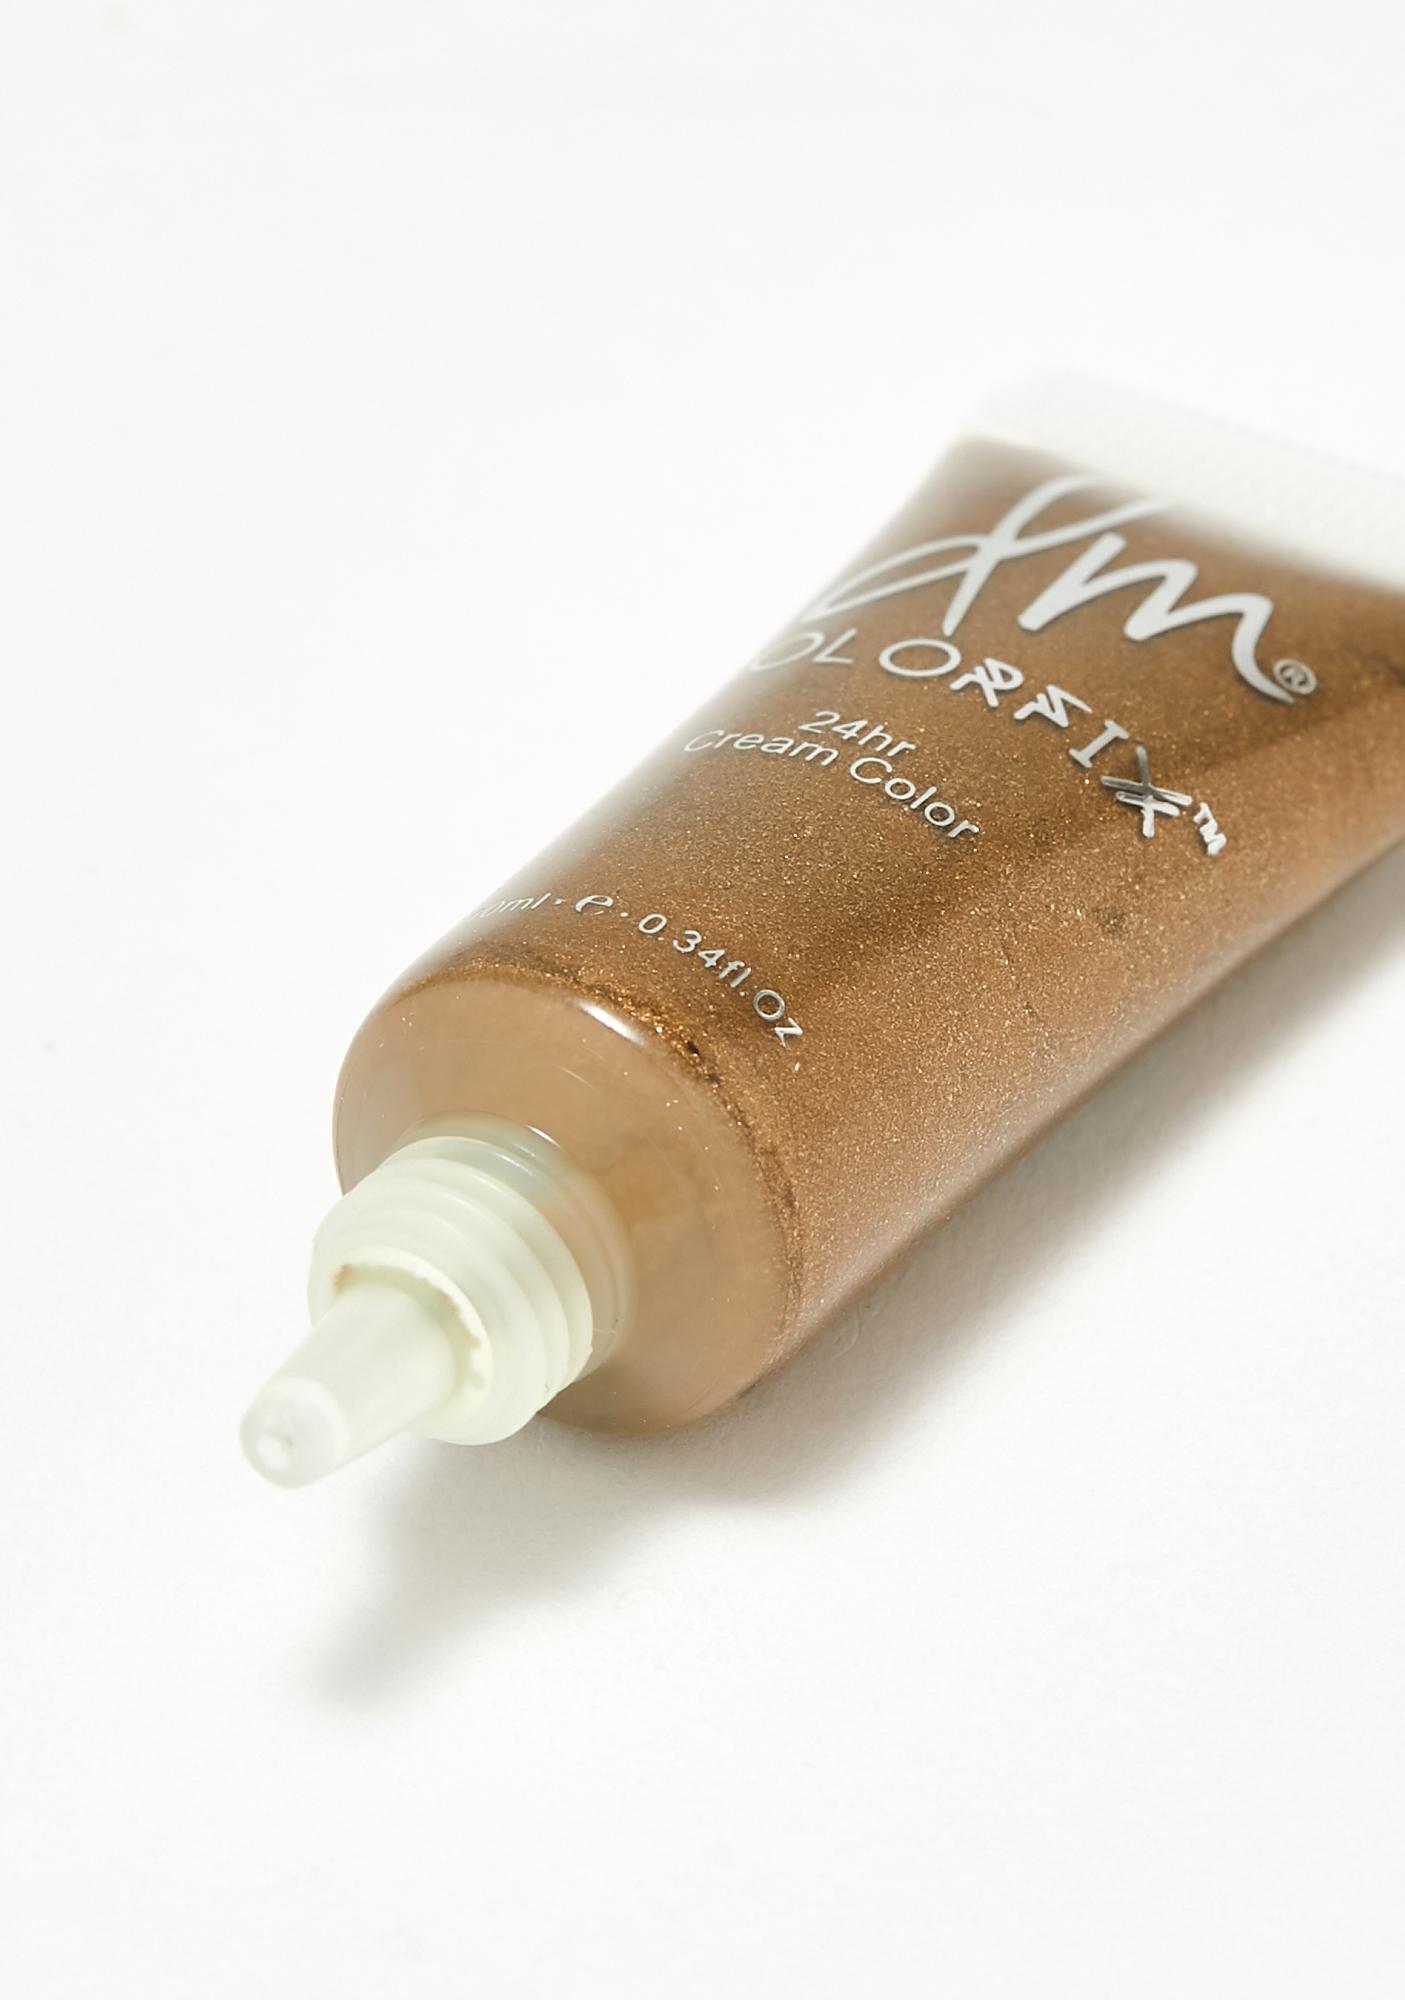 Danessa Myricks Beauty Muse Colorfix 24hr Metallic Cream